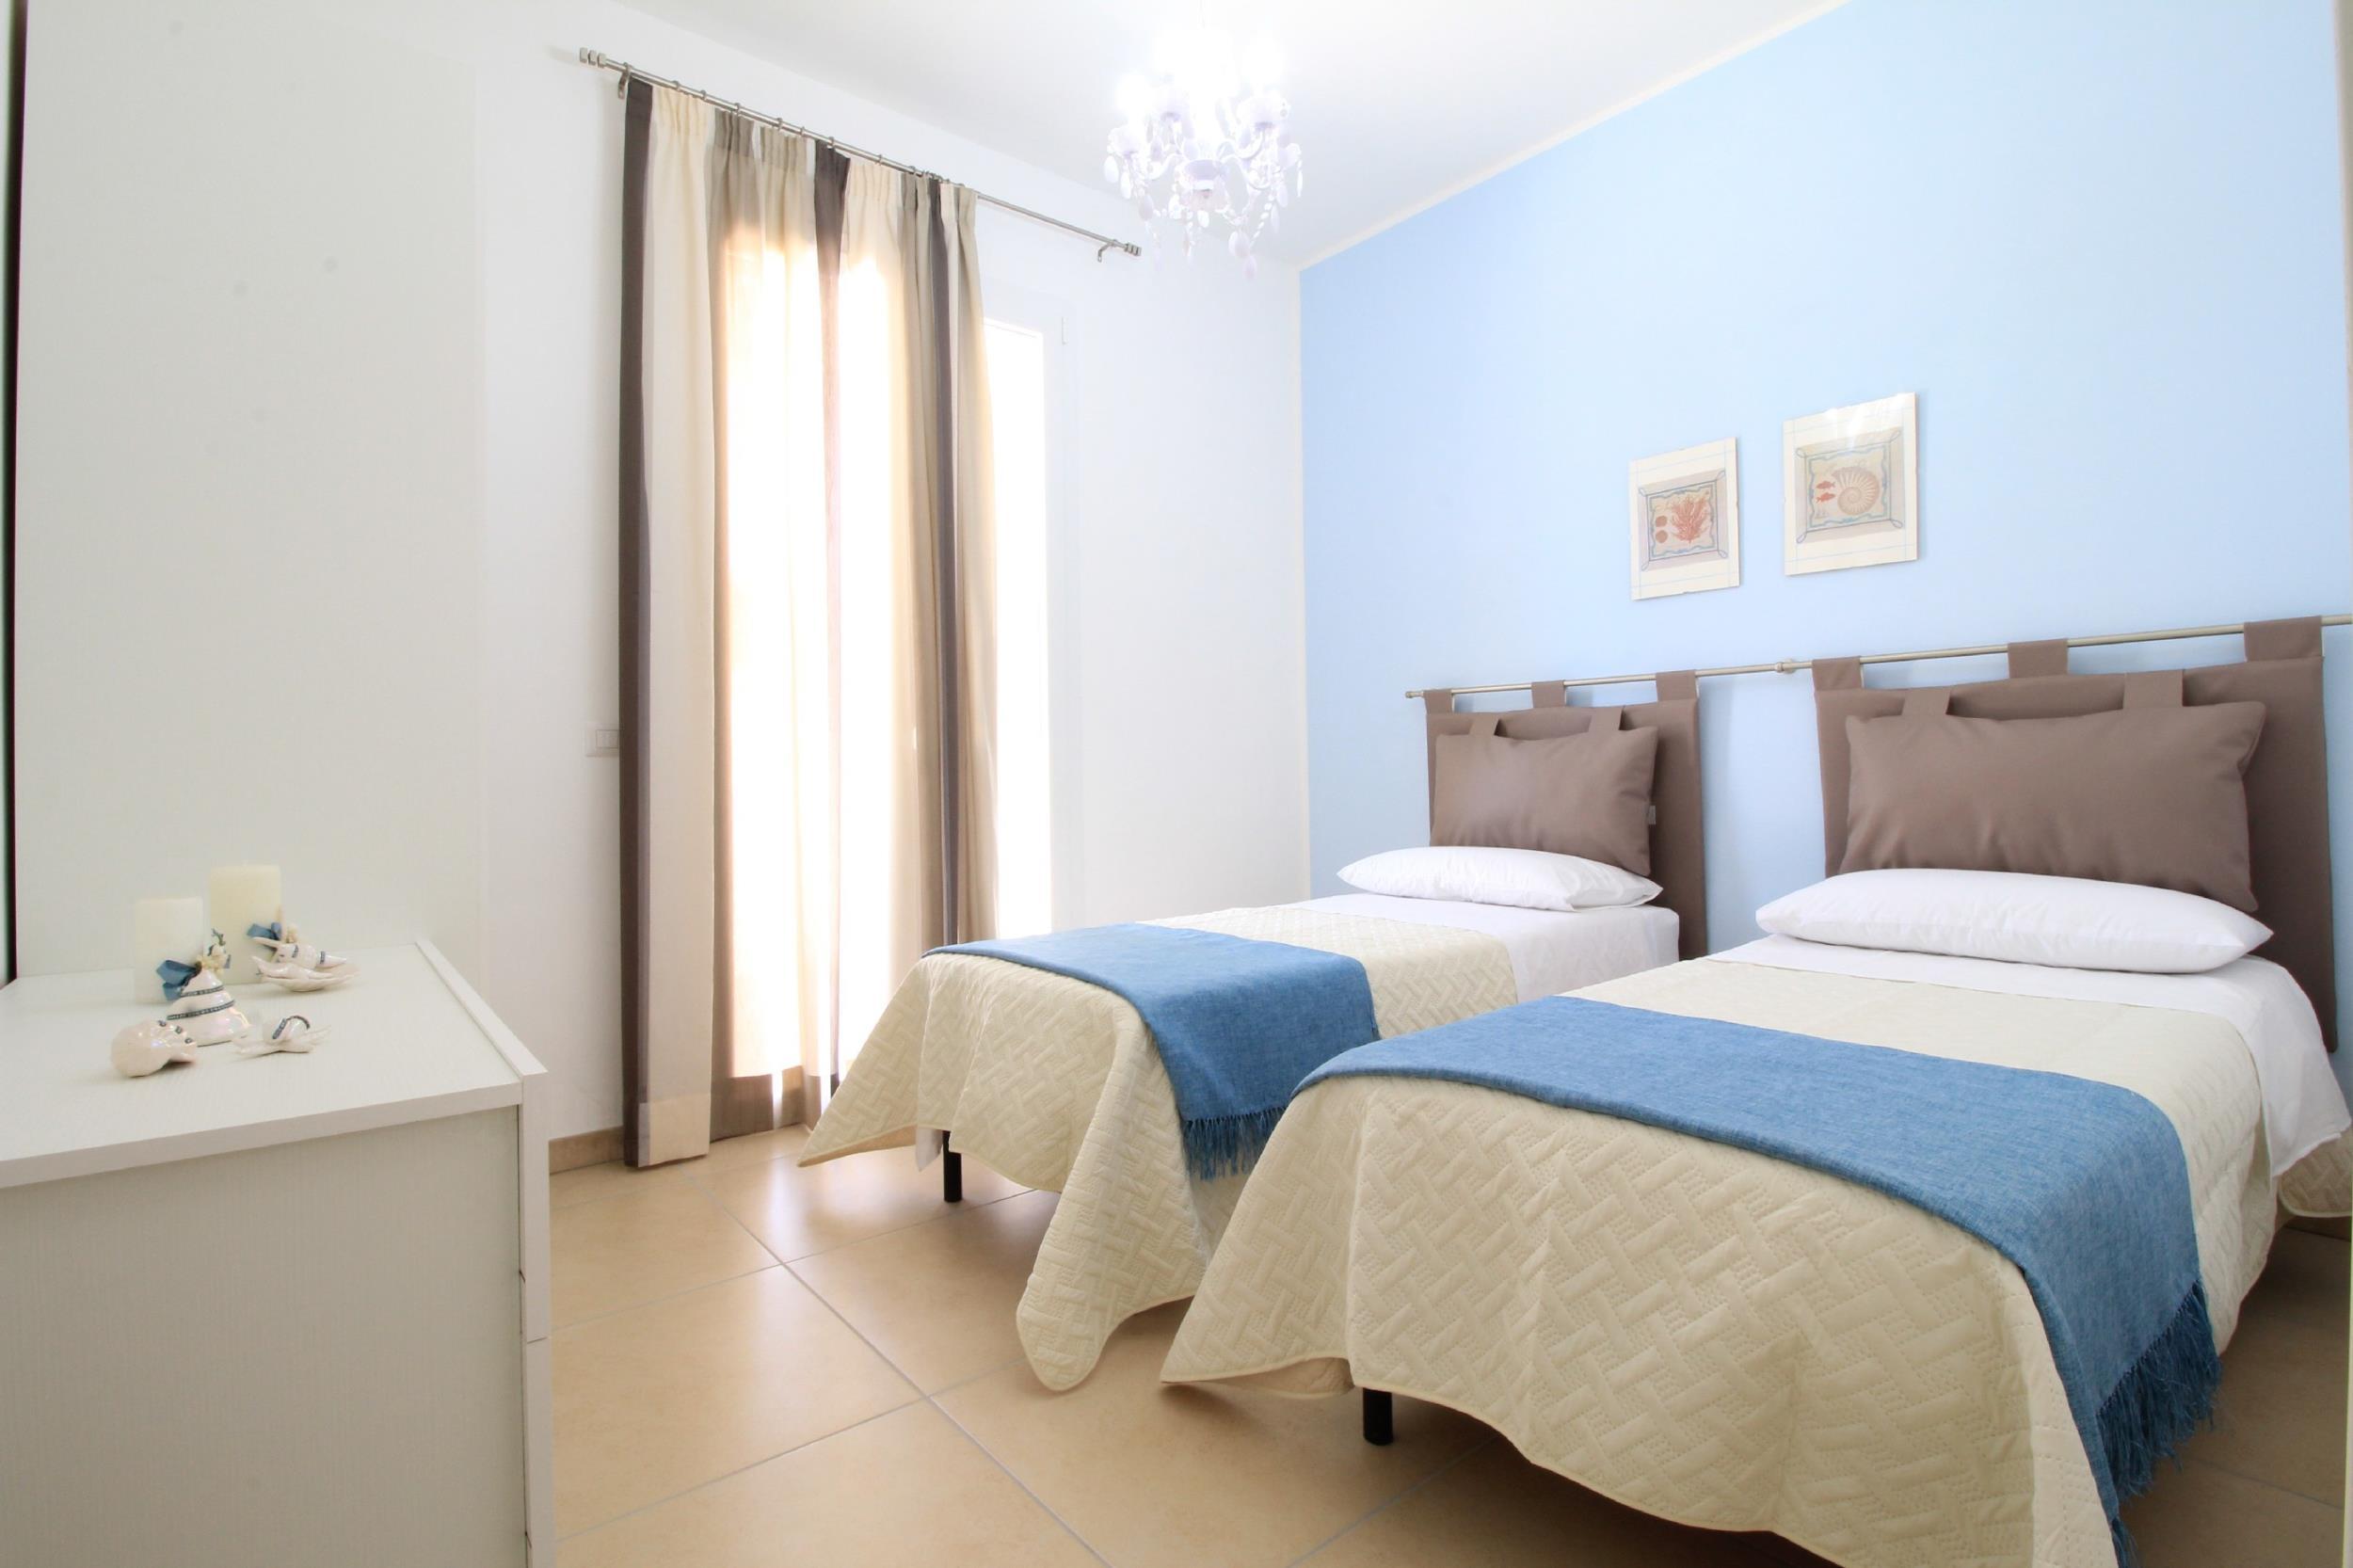 Apartment Elcisia luxe beach house photo 23457107